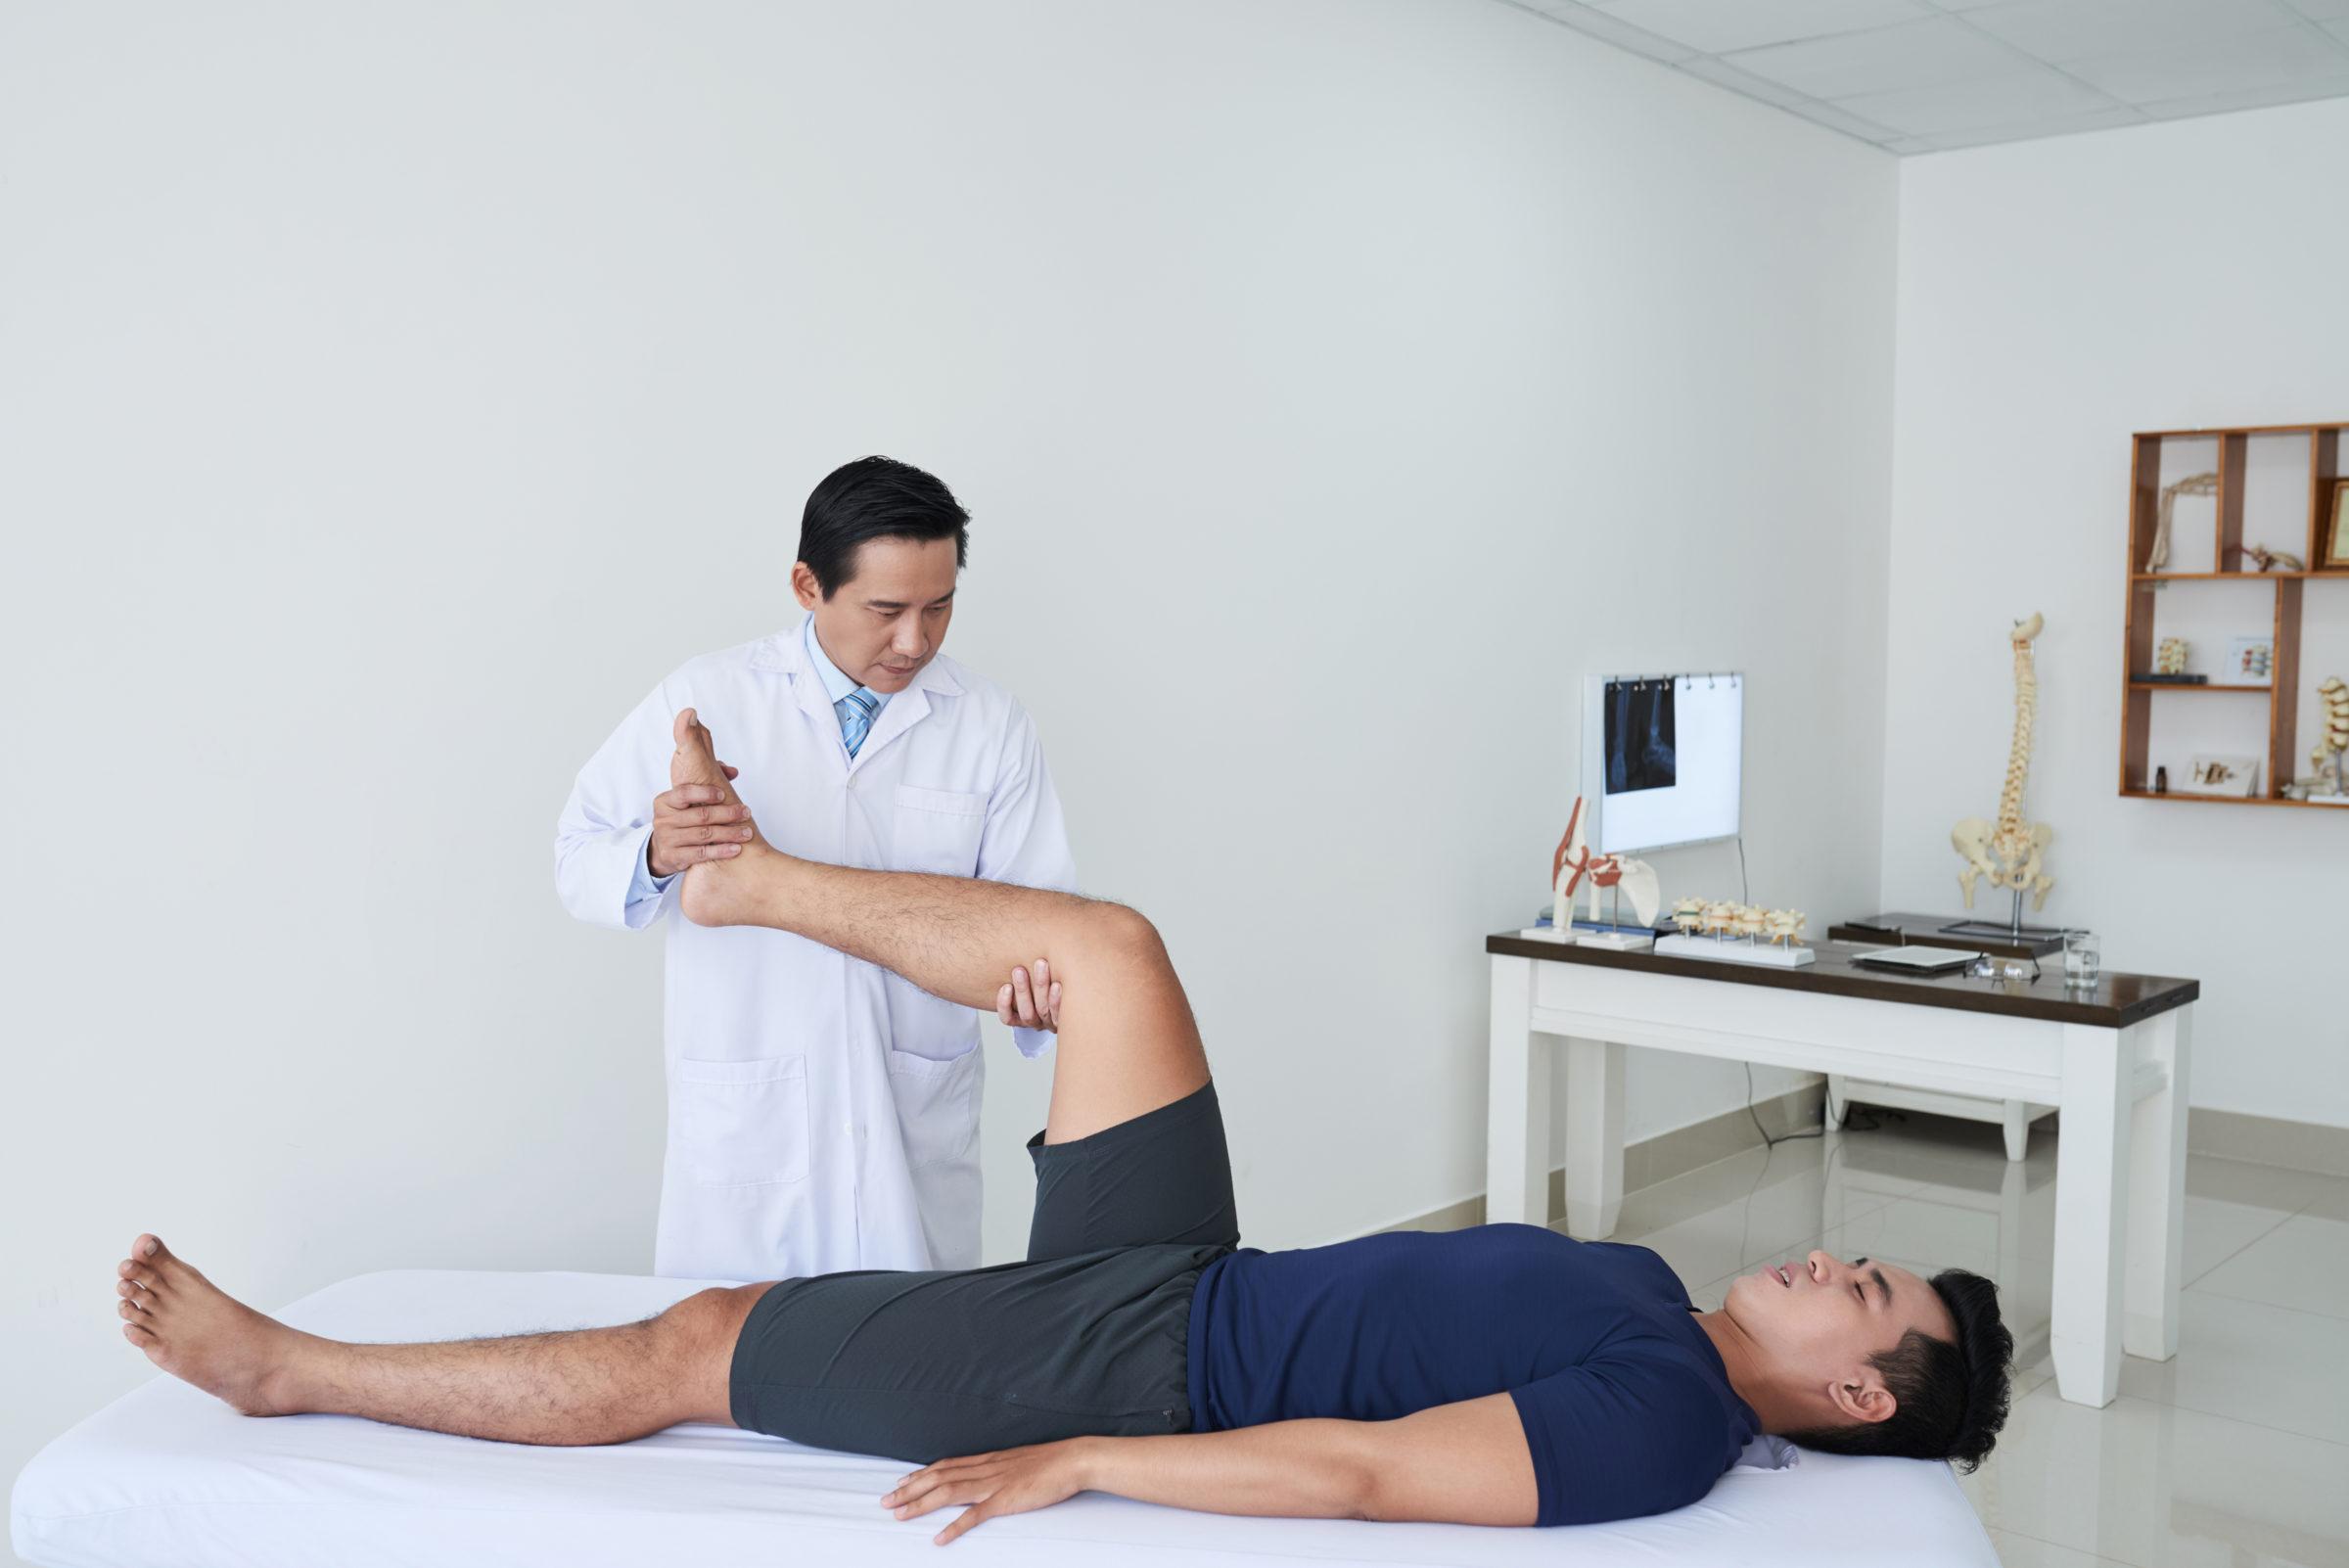 rehabilitation therapy KH4369B